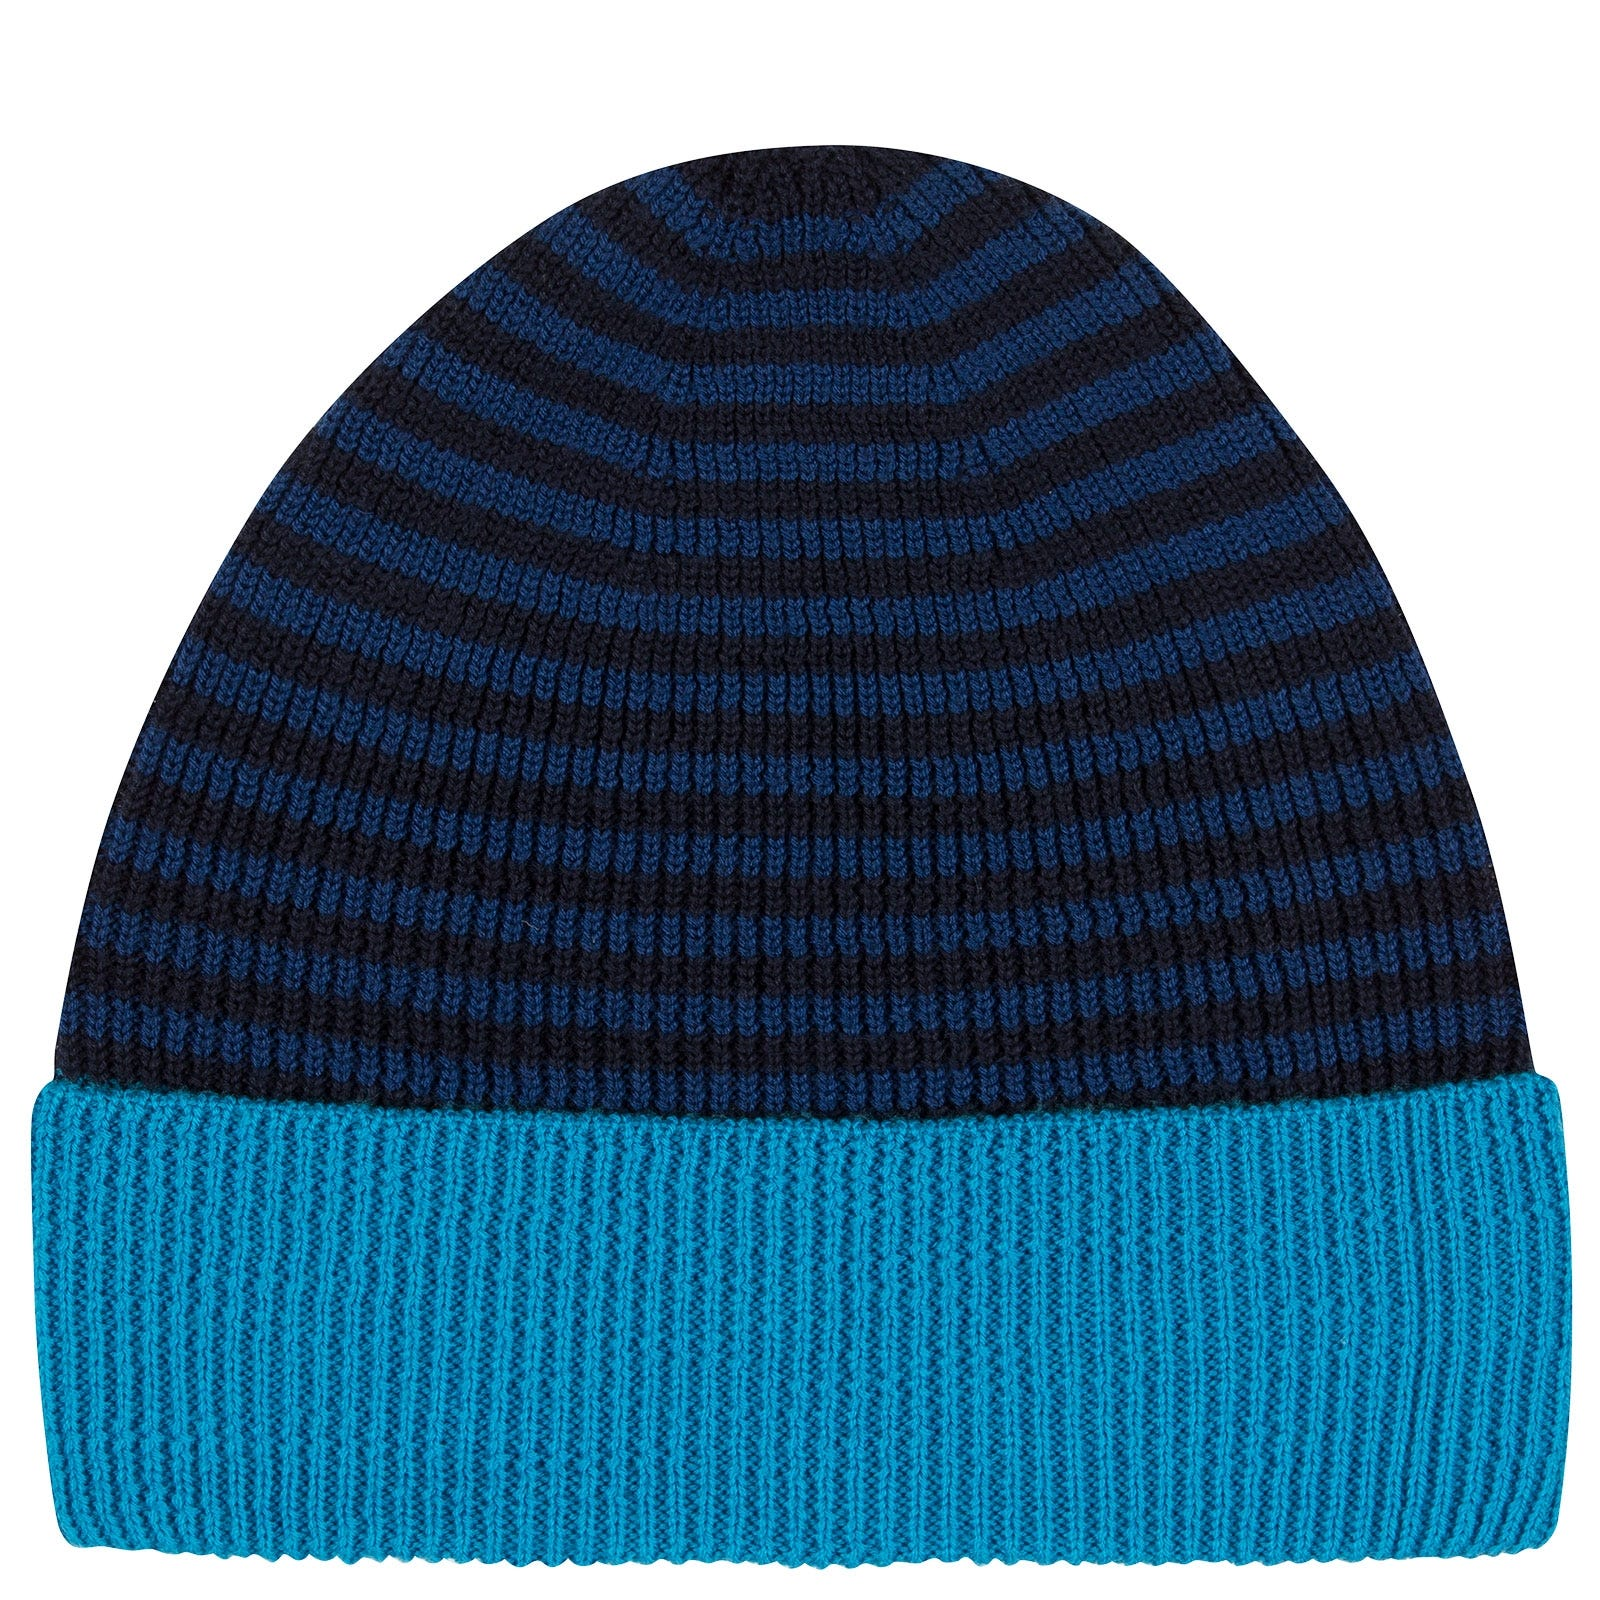 John Smedley Hubble Merino Wool Hat in Midnight-ONE